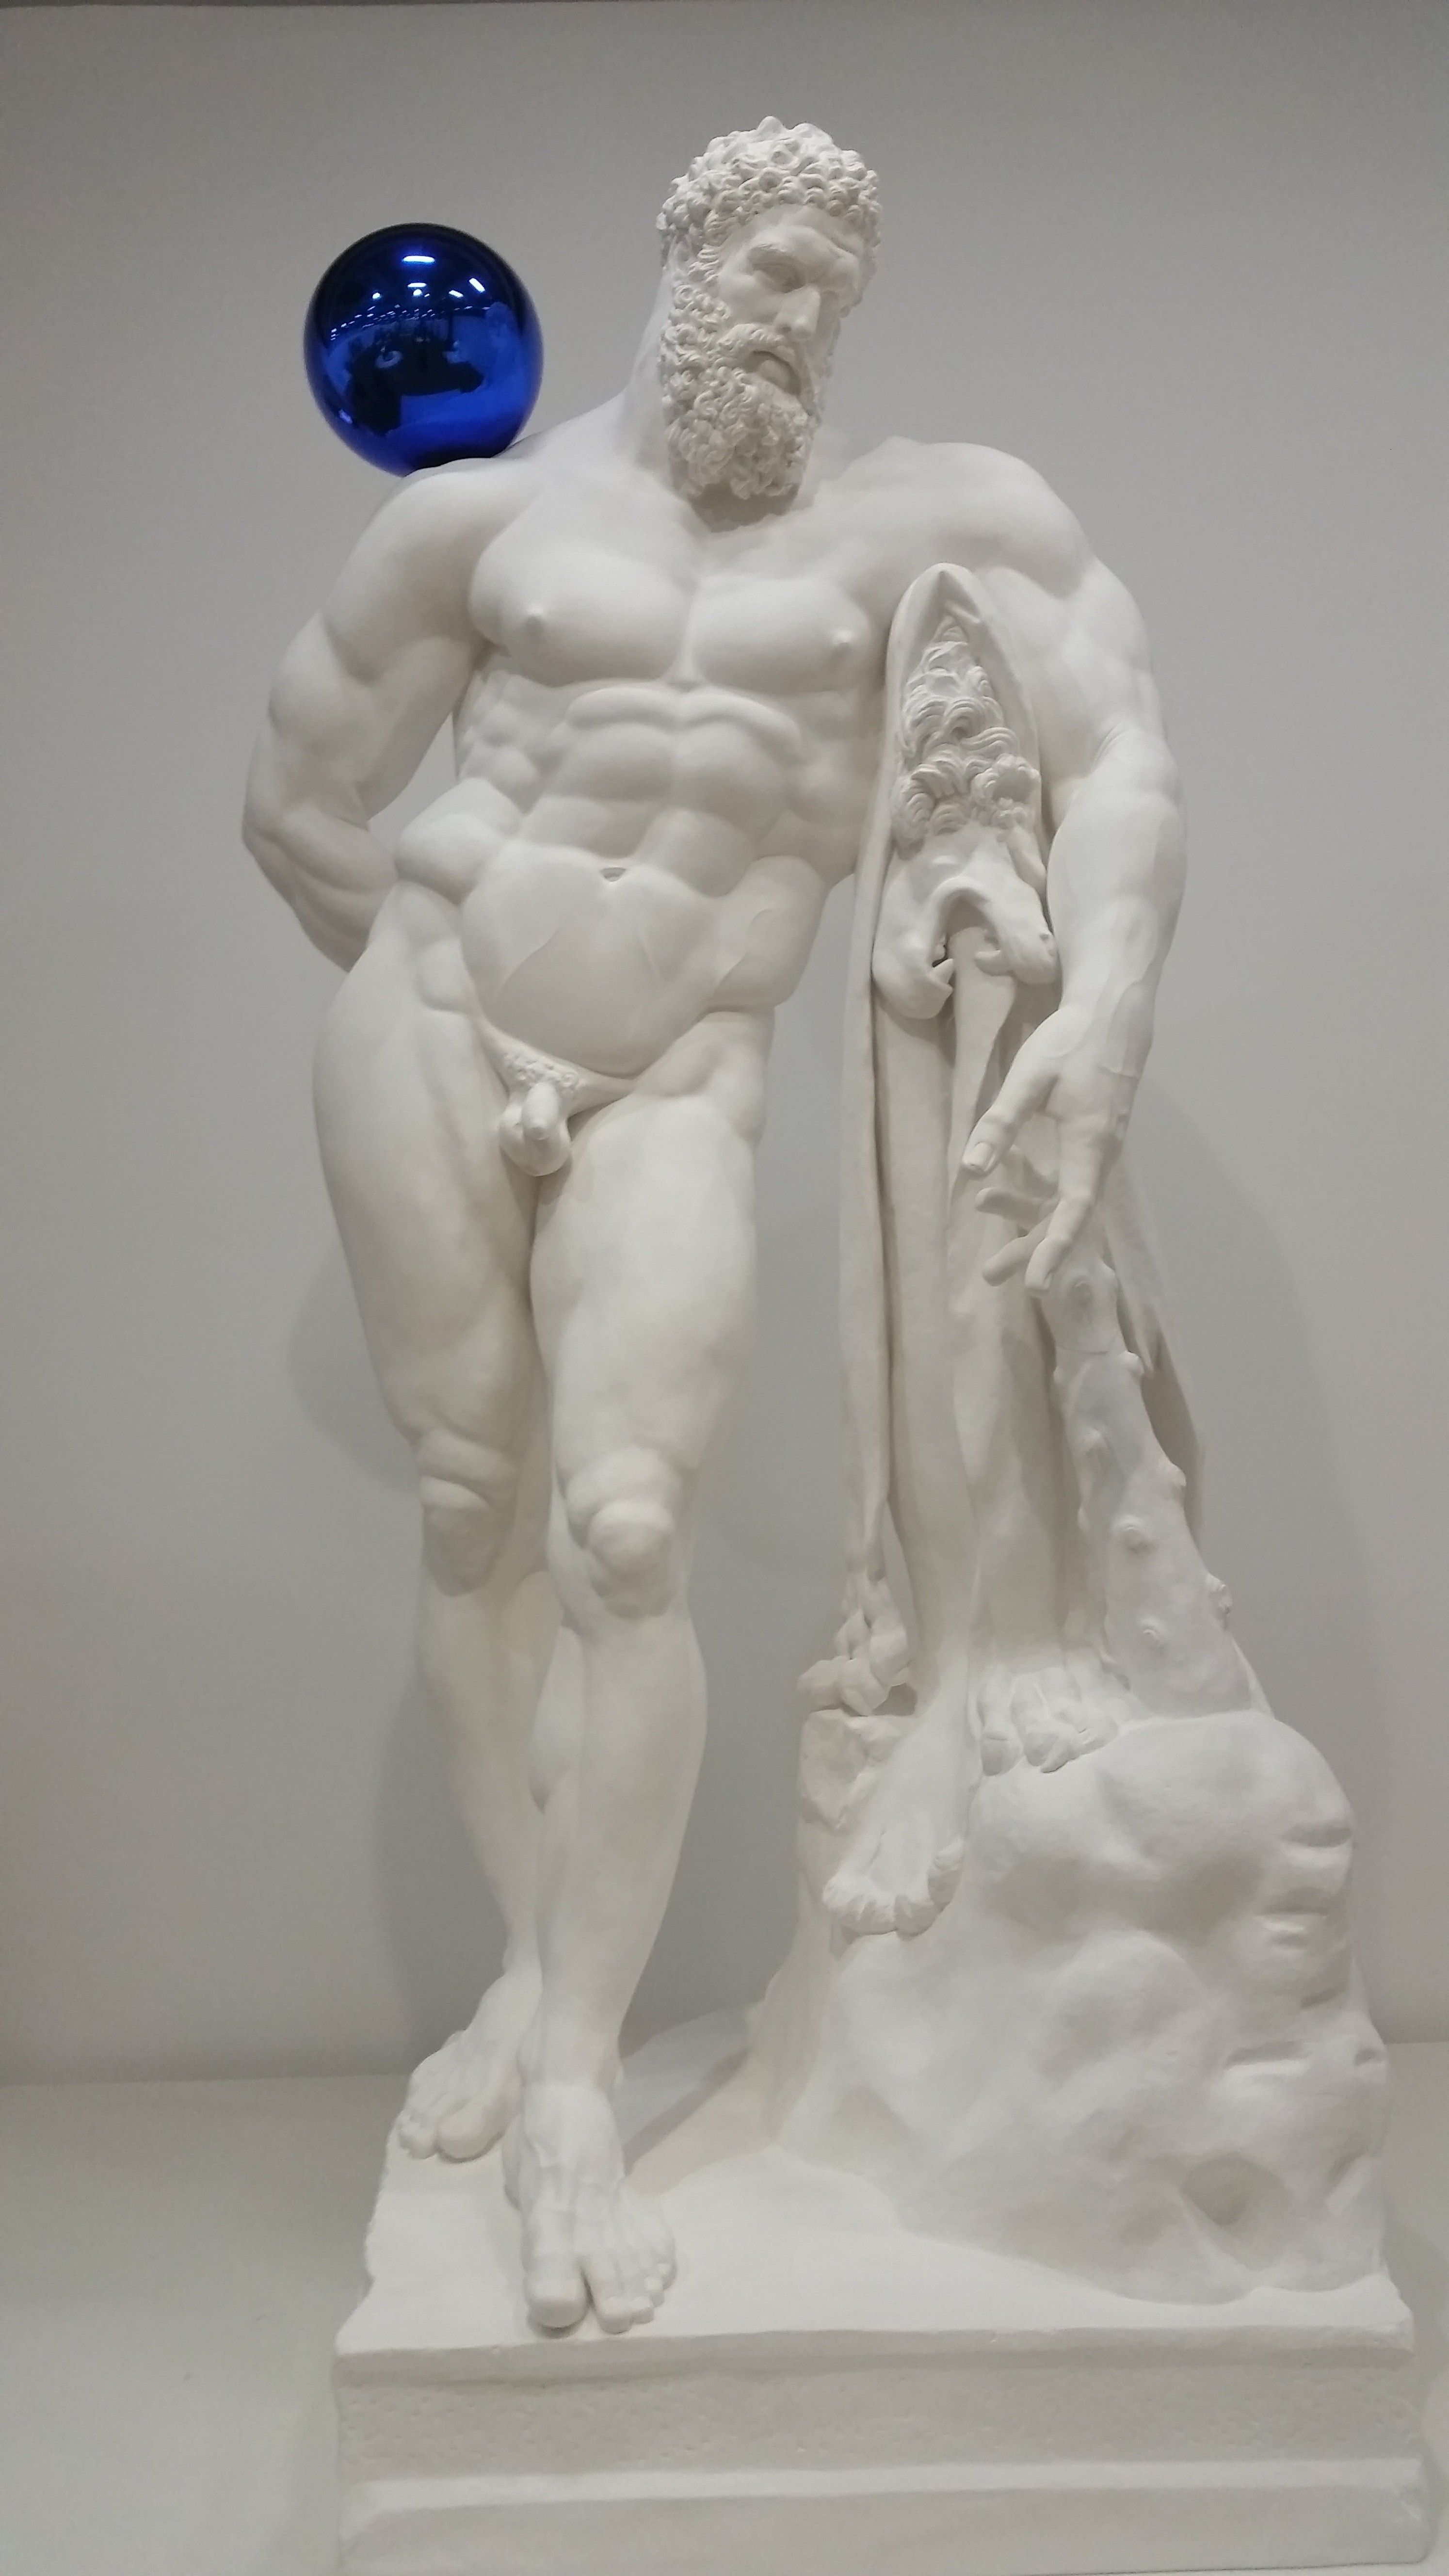 JEFF KOONS Gazing Ball Farnese Hercules 2013